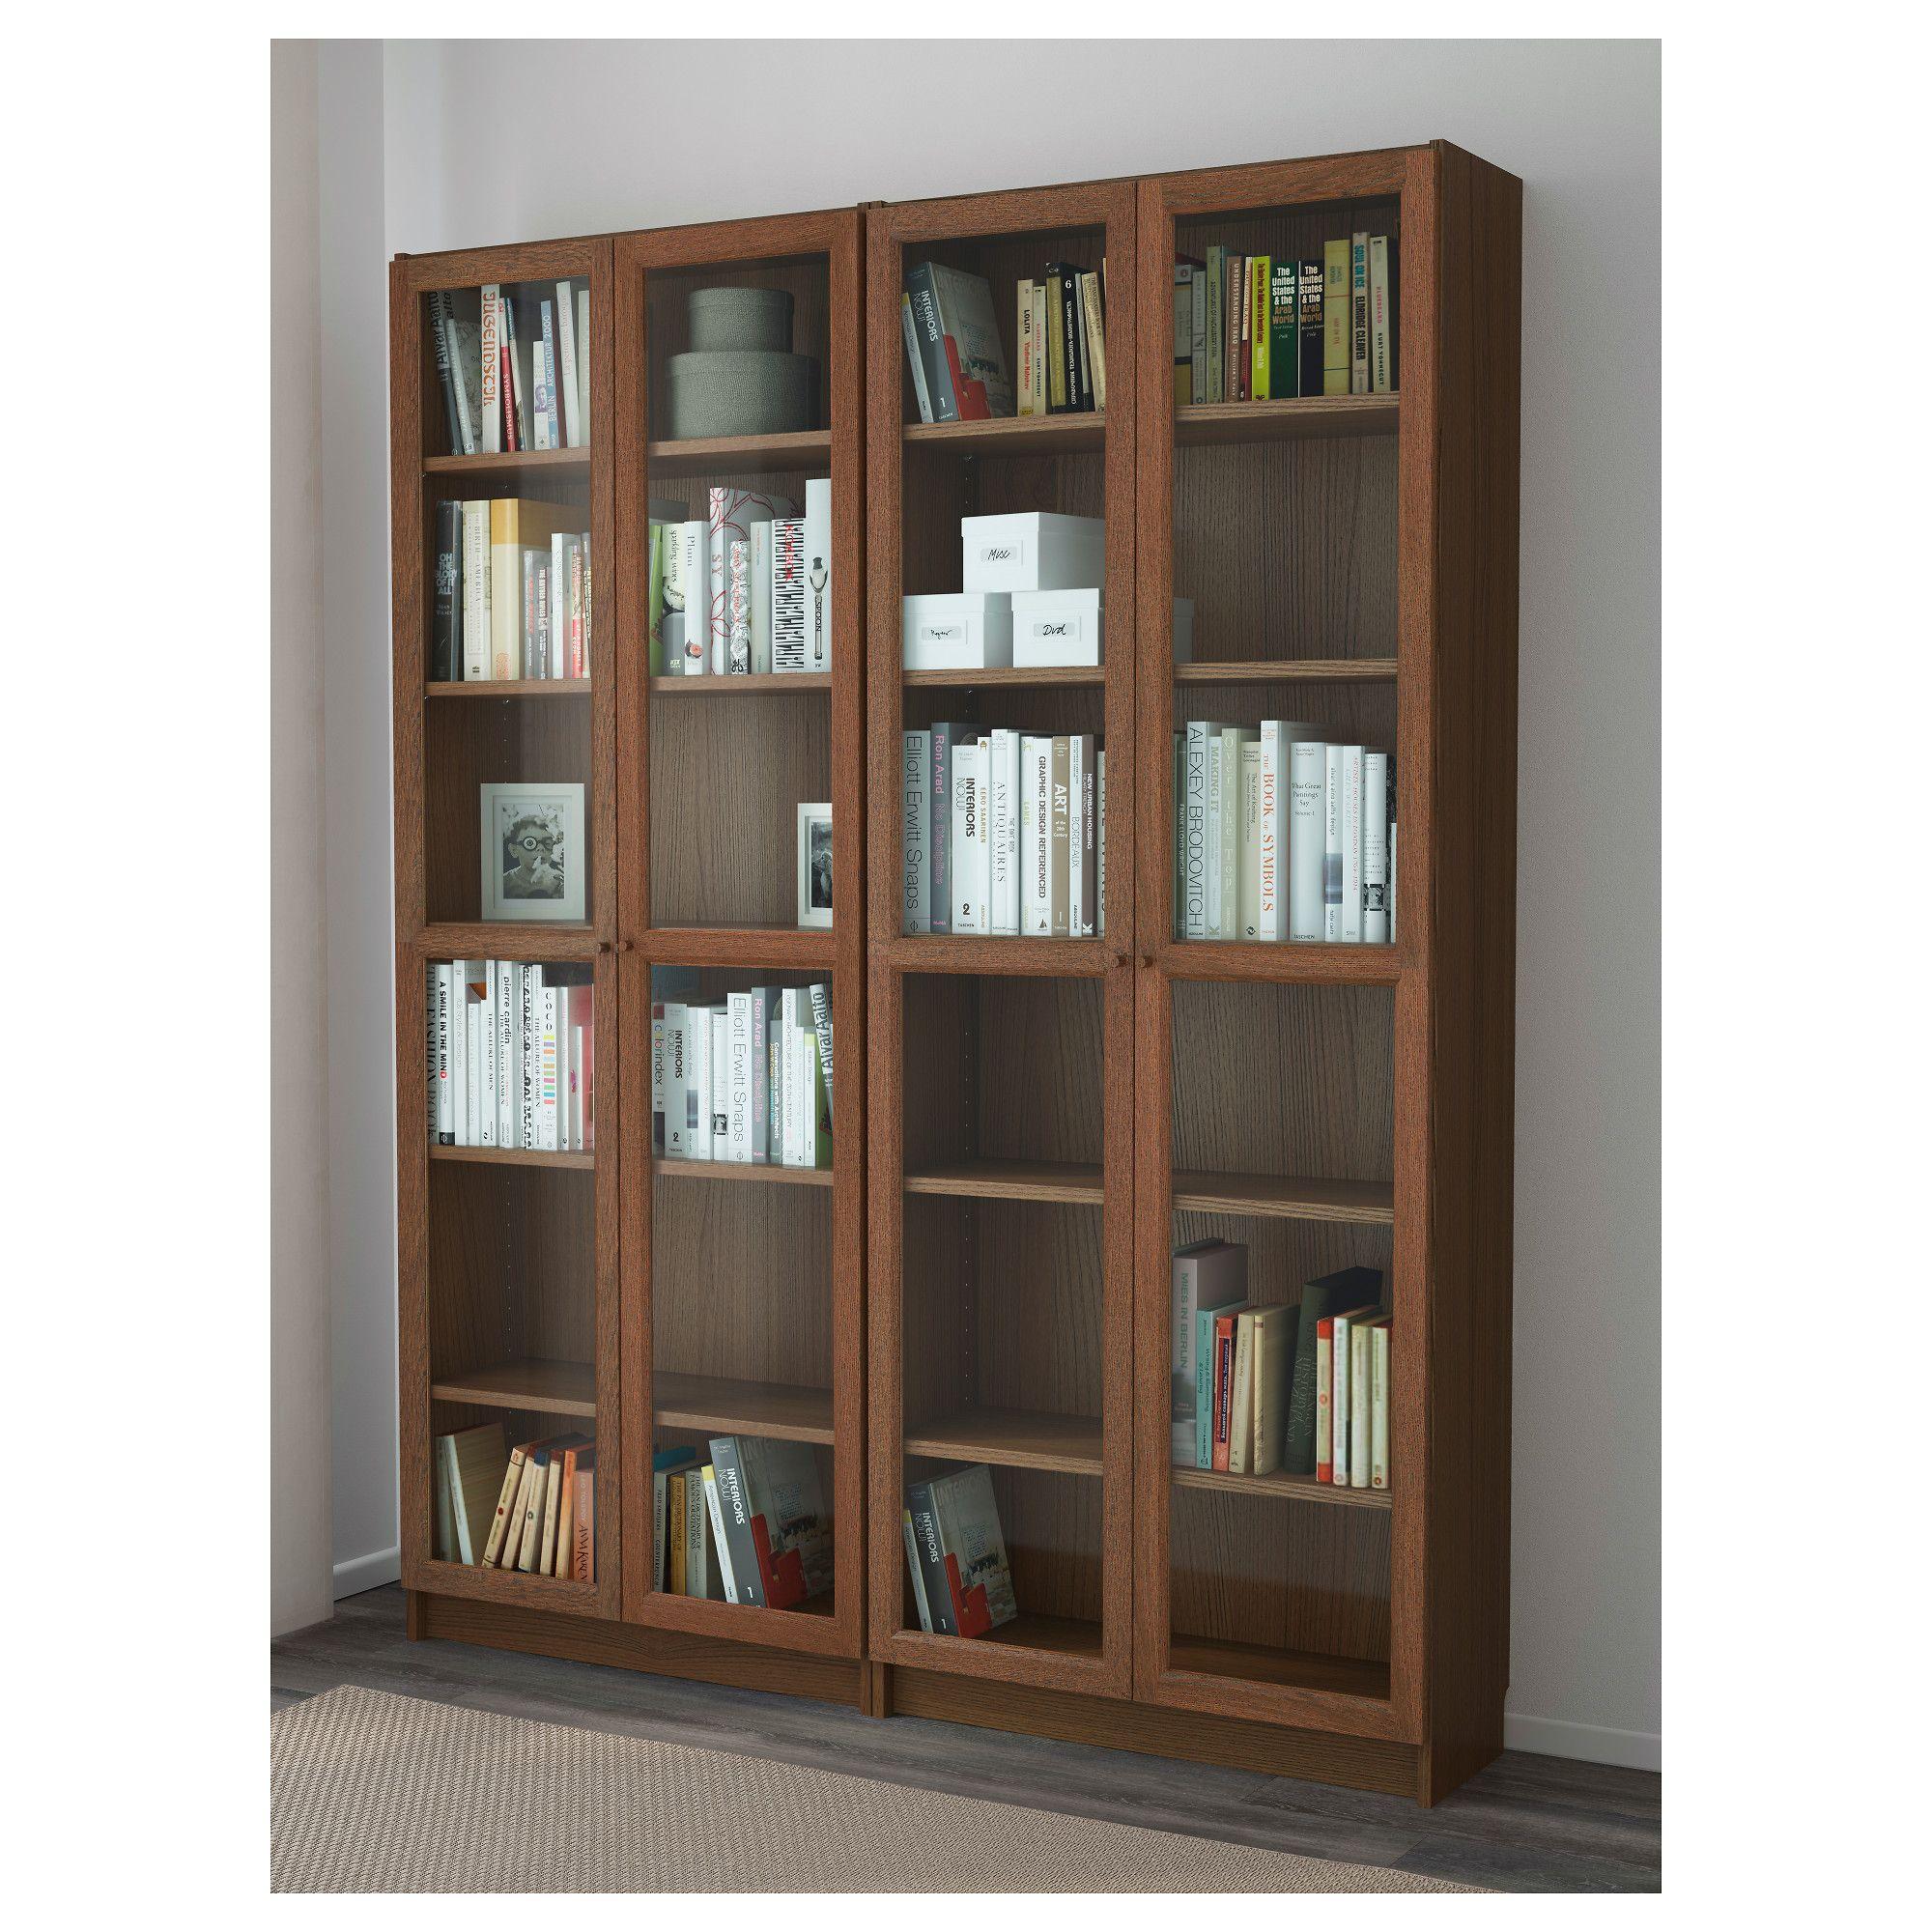 Furniture Home Furnishings Find Your Inspiration Bookcase Glass Shelves Ikea Ikea